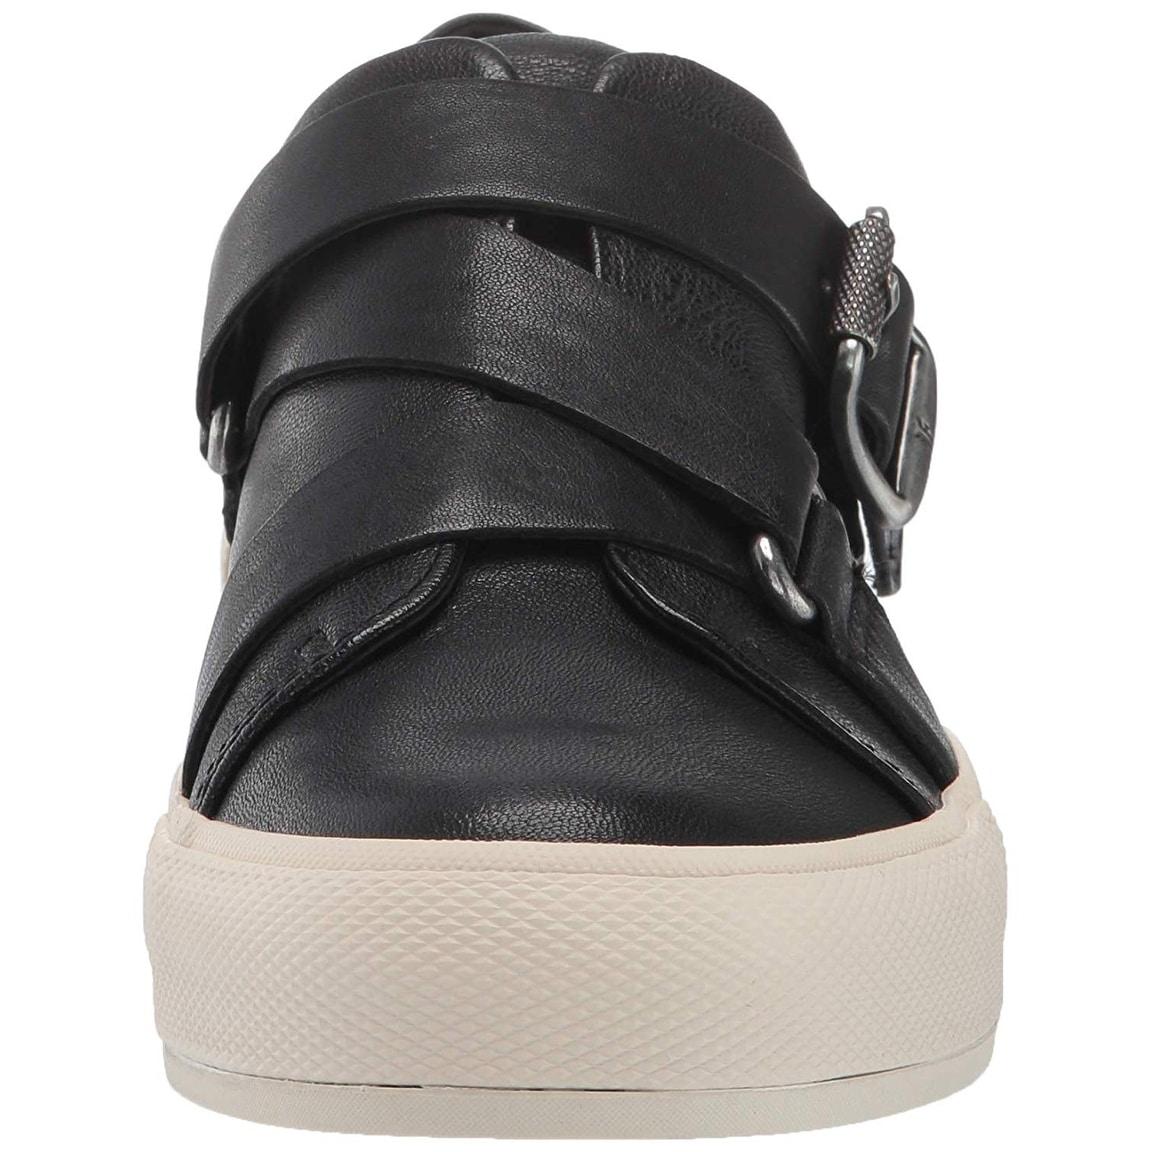 Frye Womens Gia Moto Low Sneaker